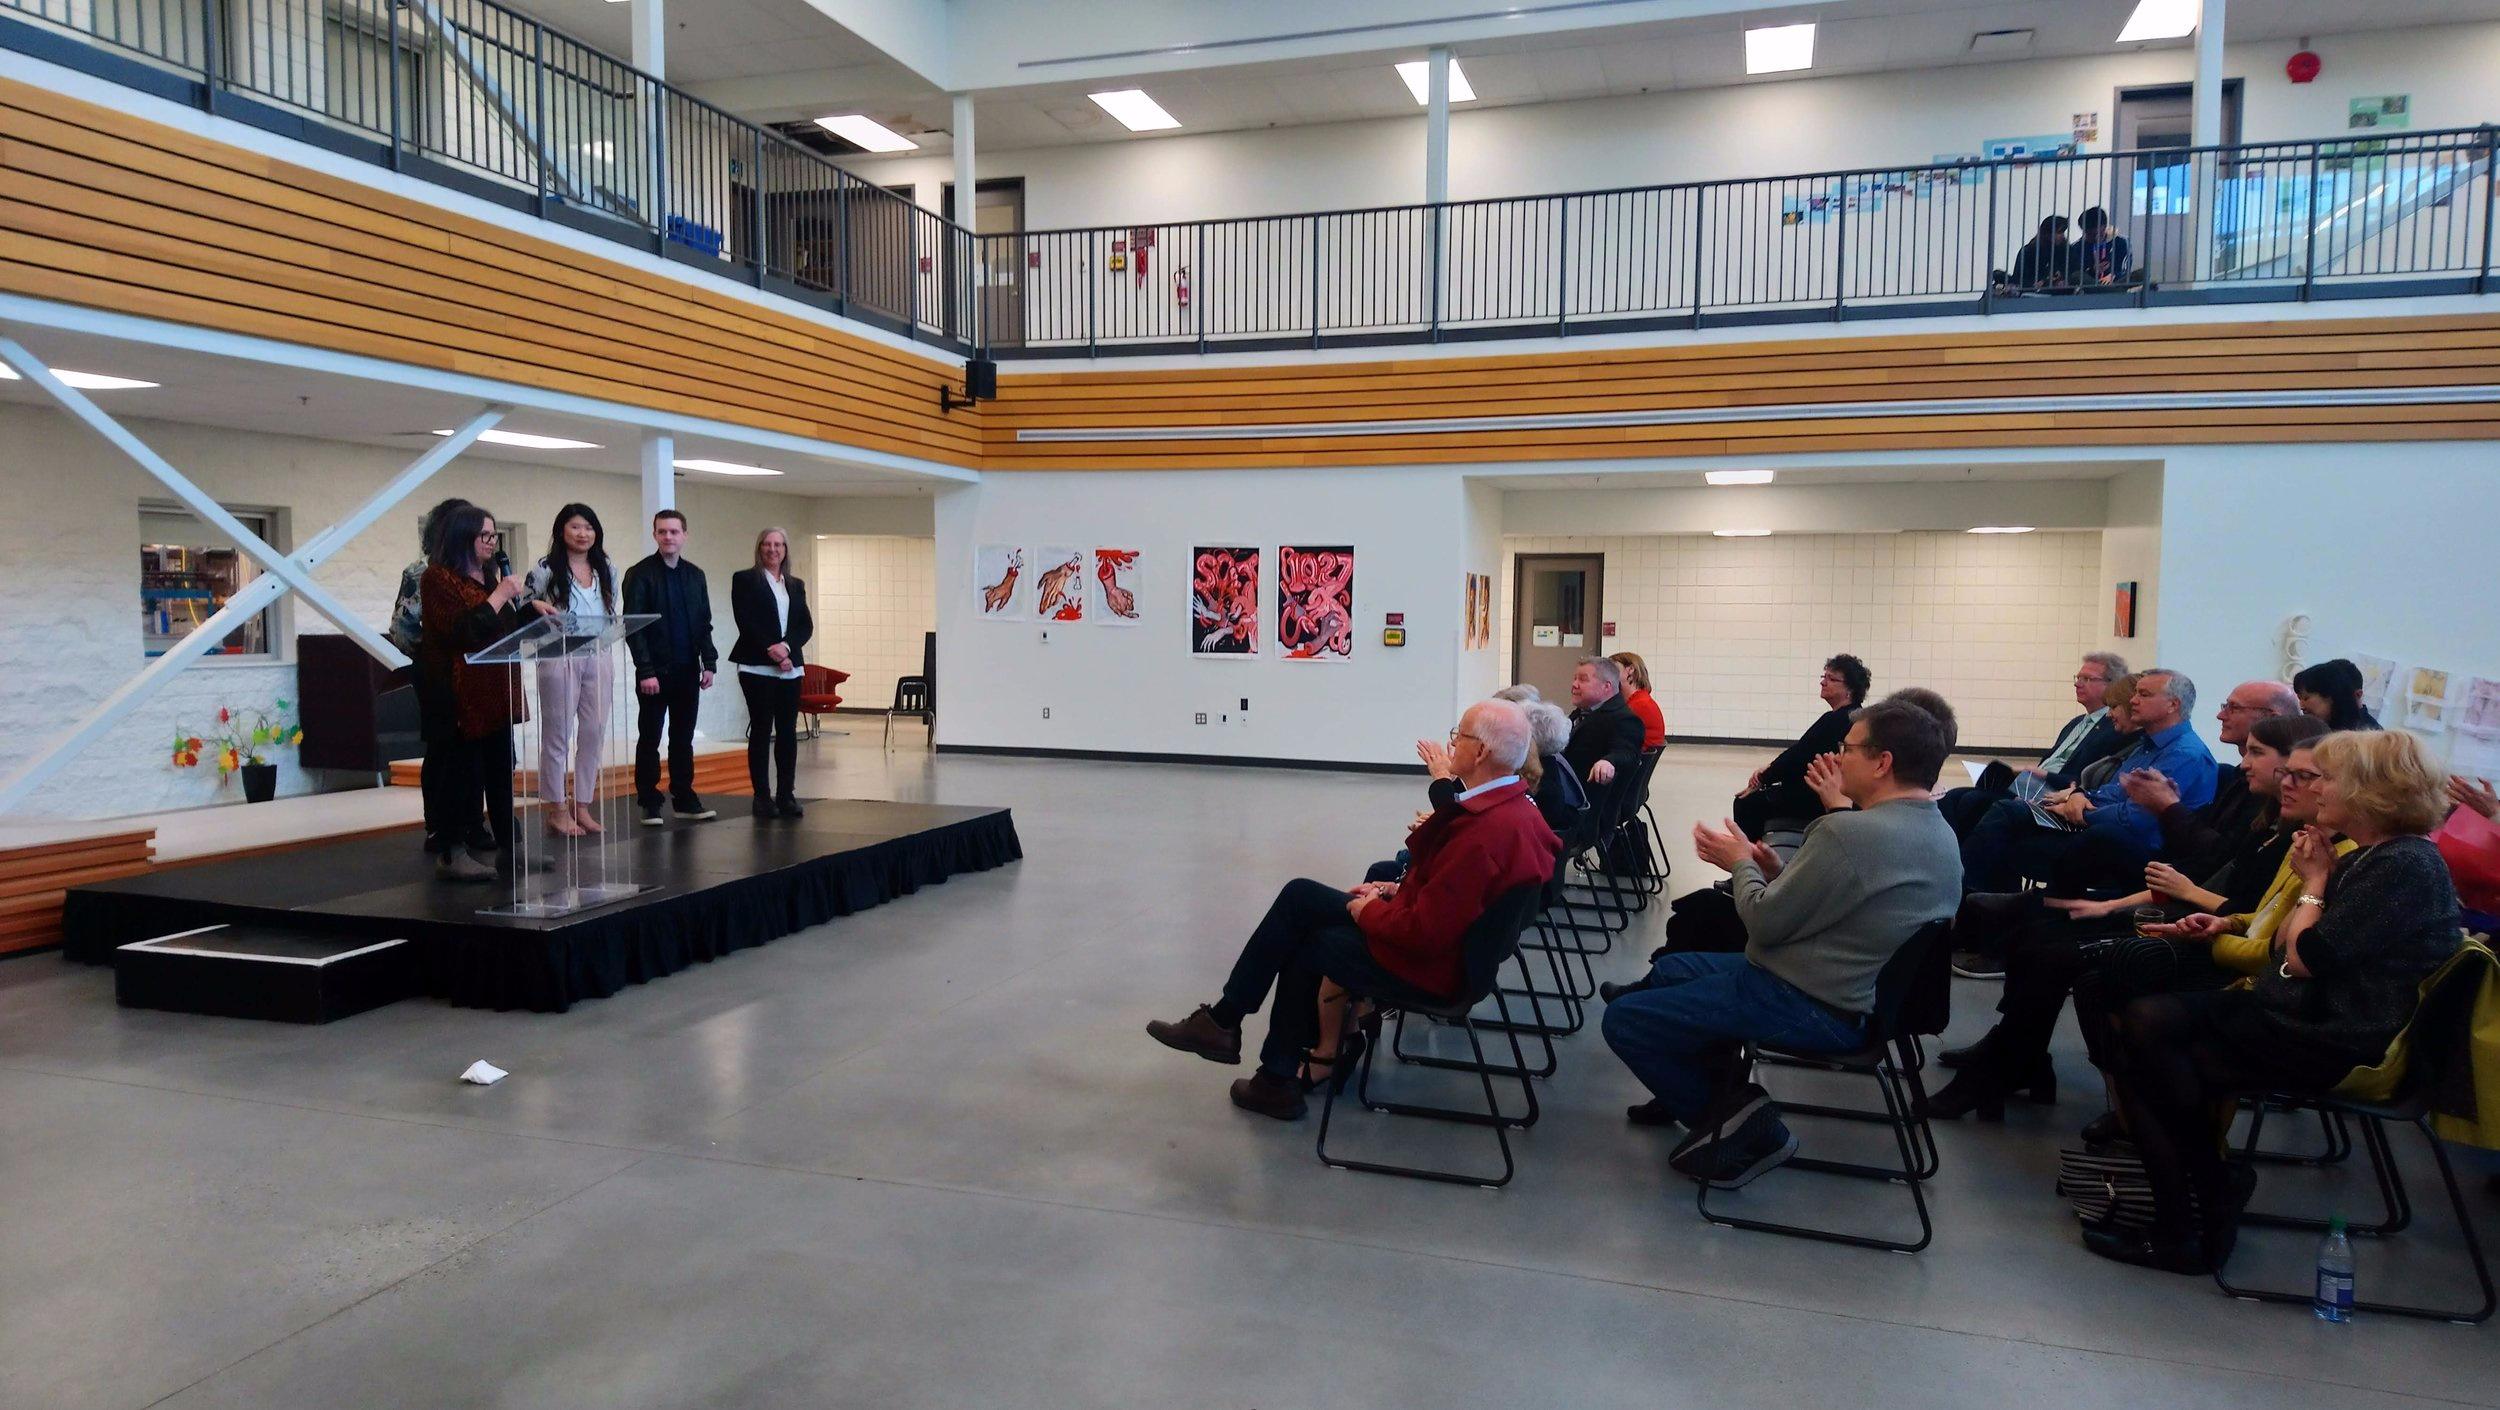 4th Year Instructor Elizabeth Barnes with Graduating Students Shandis Harrison, Eva Yang, Ryan Broderick, and Angela Wells